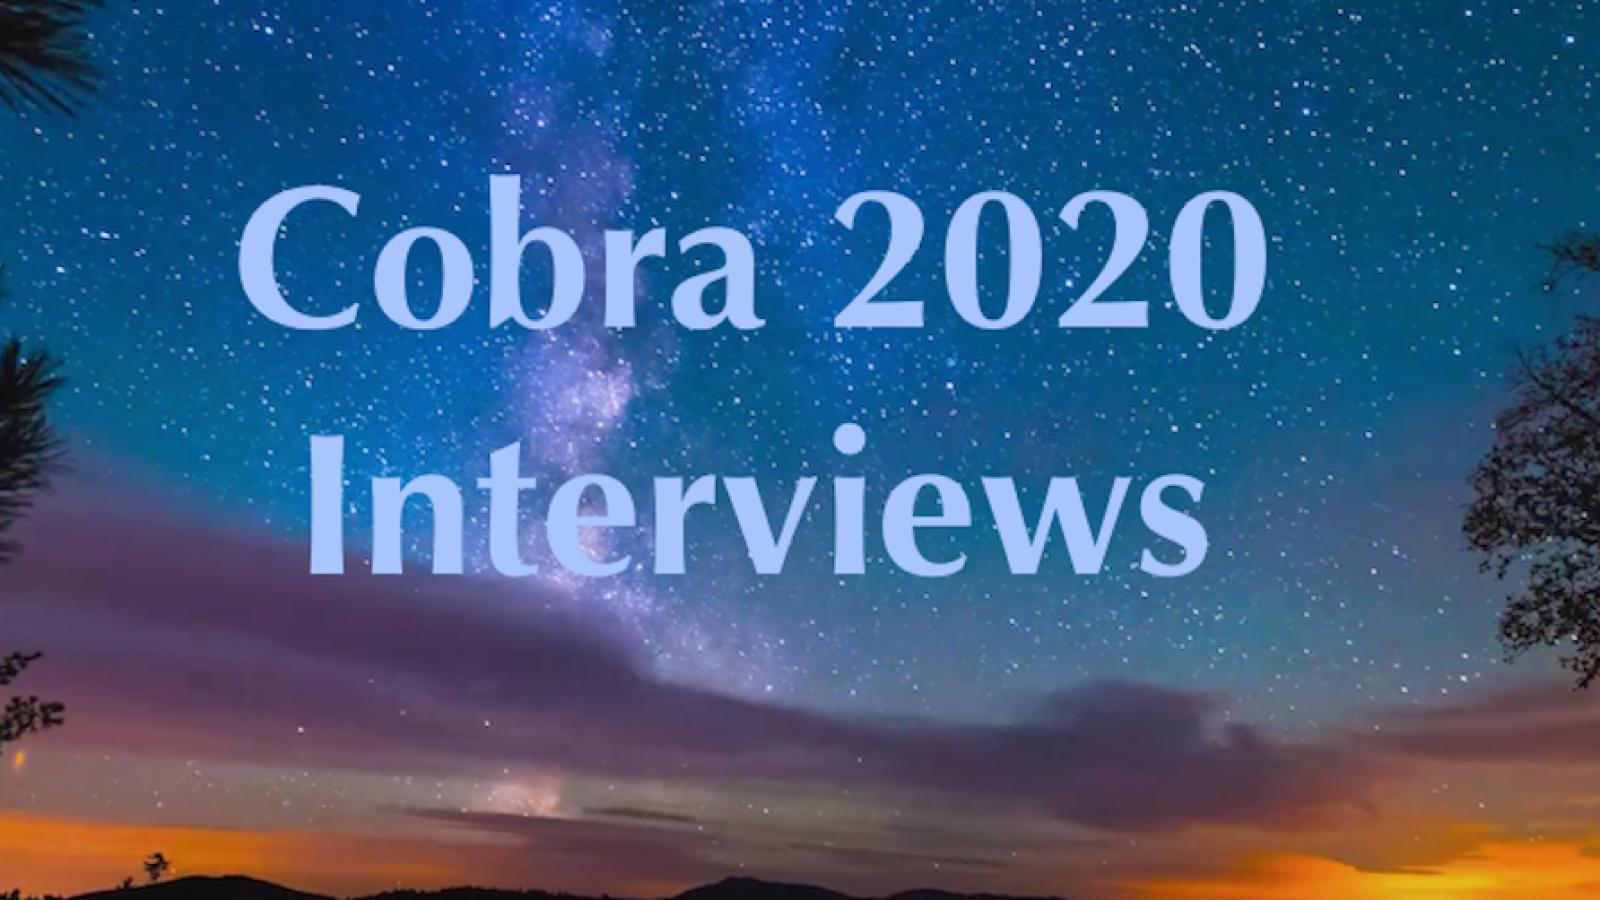 cobra2020interviewsfeature